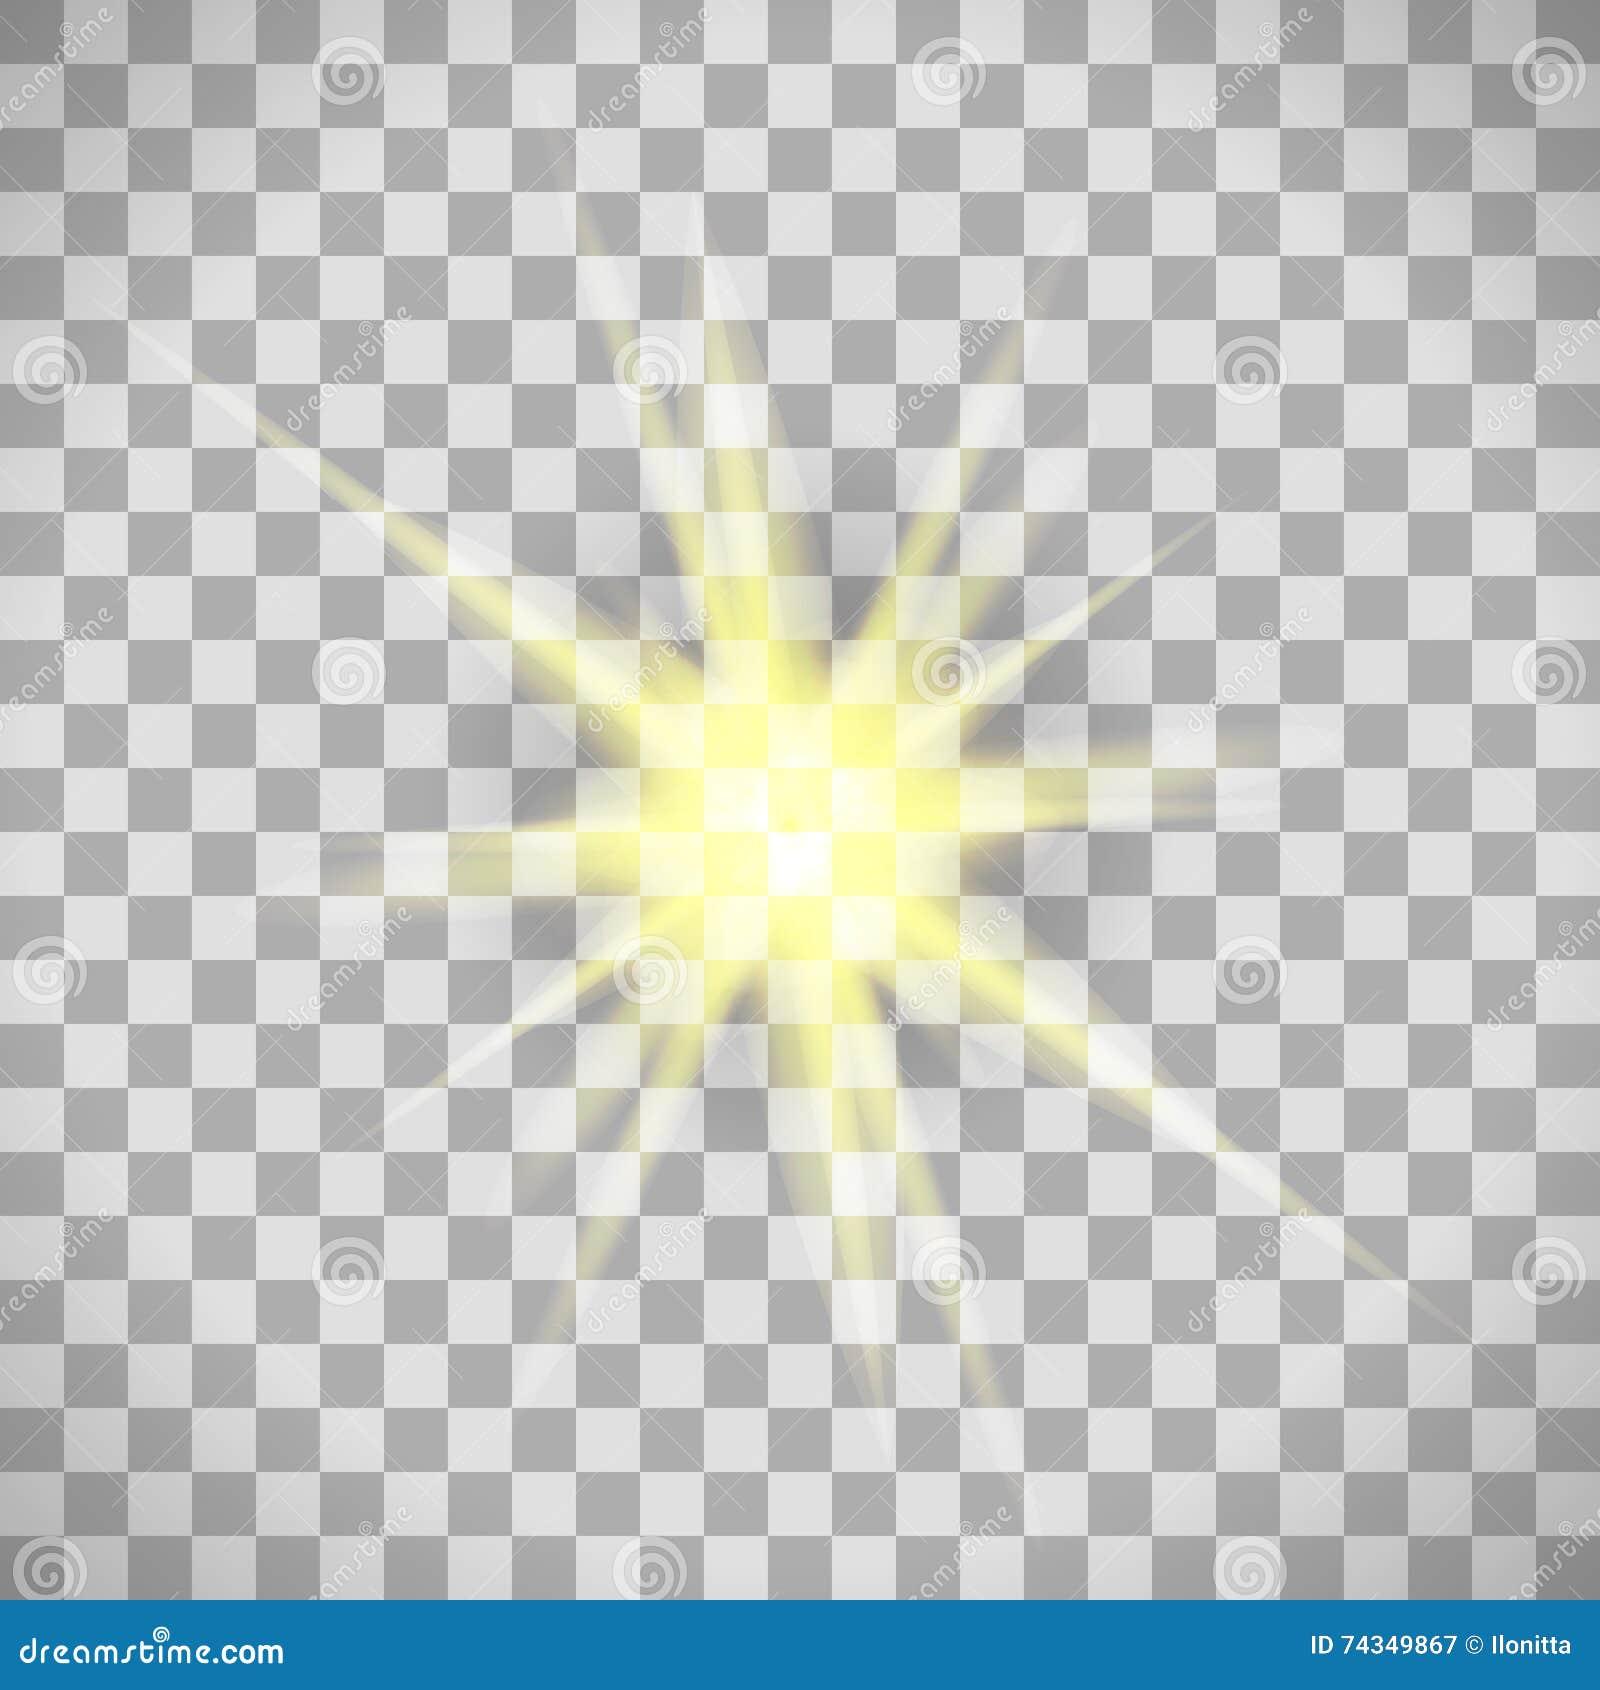 Transparent Background Star Light